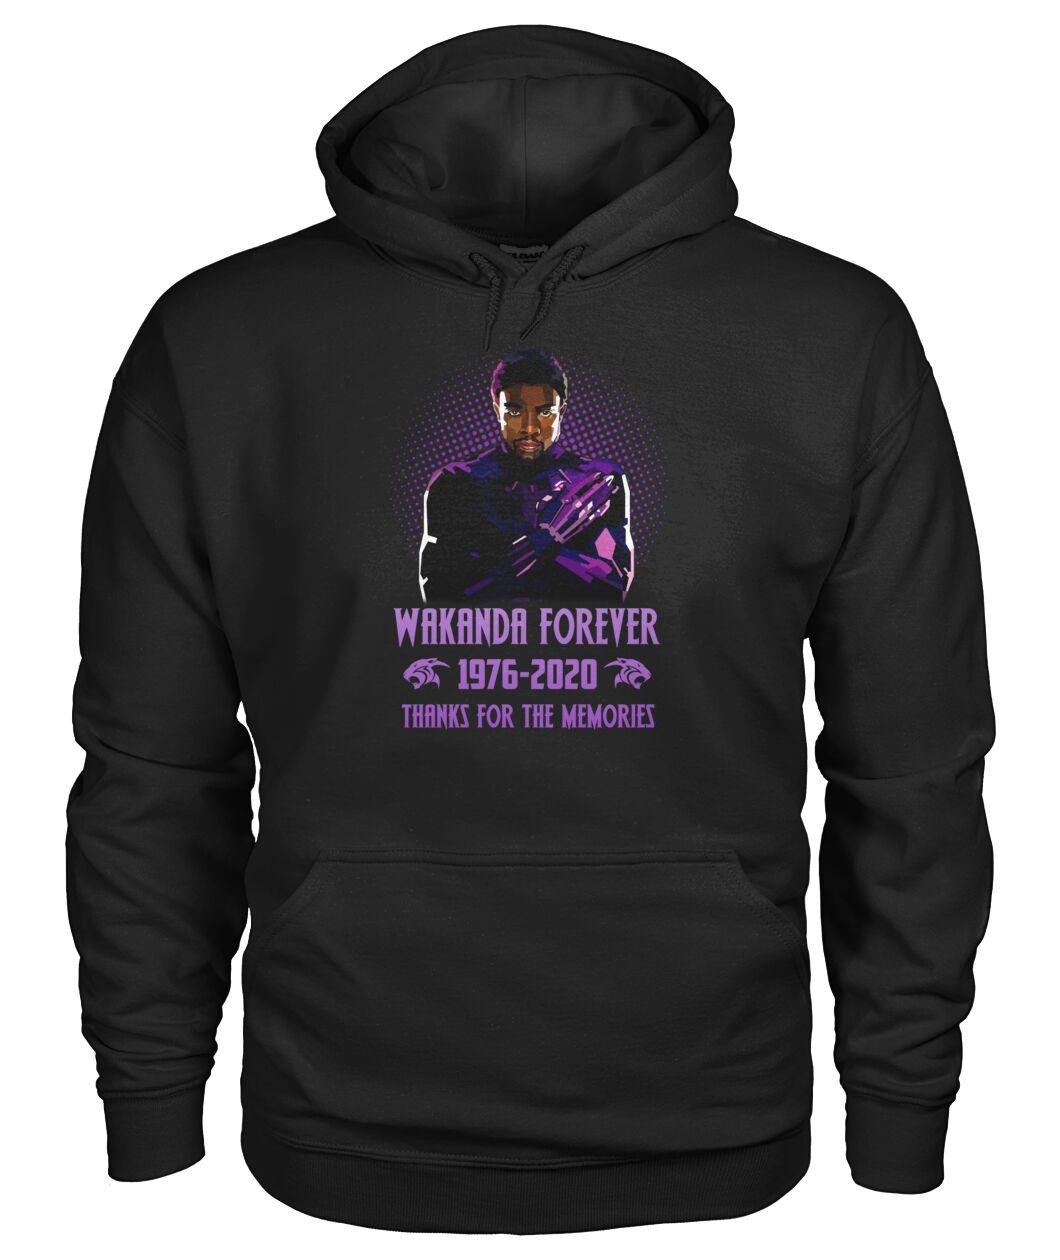 Wakanda Forever 1976-2020 Thanks for the memories hoodie